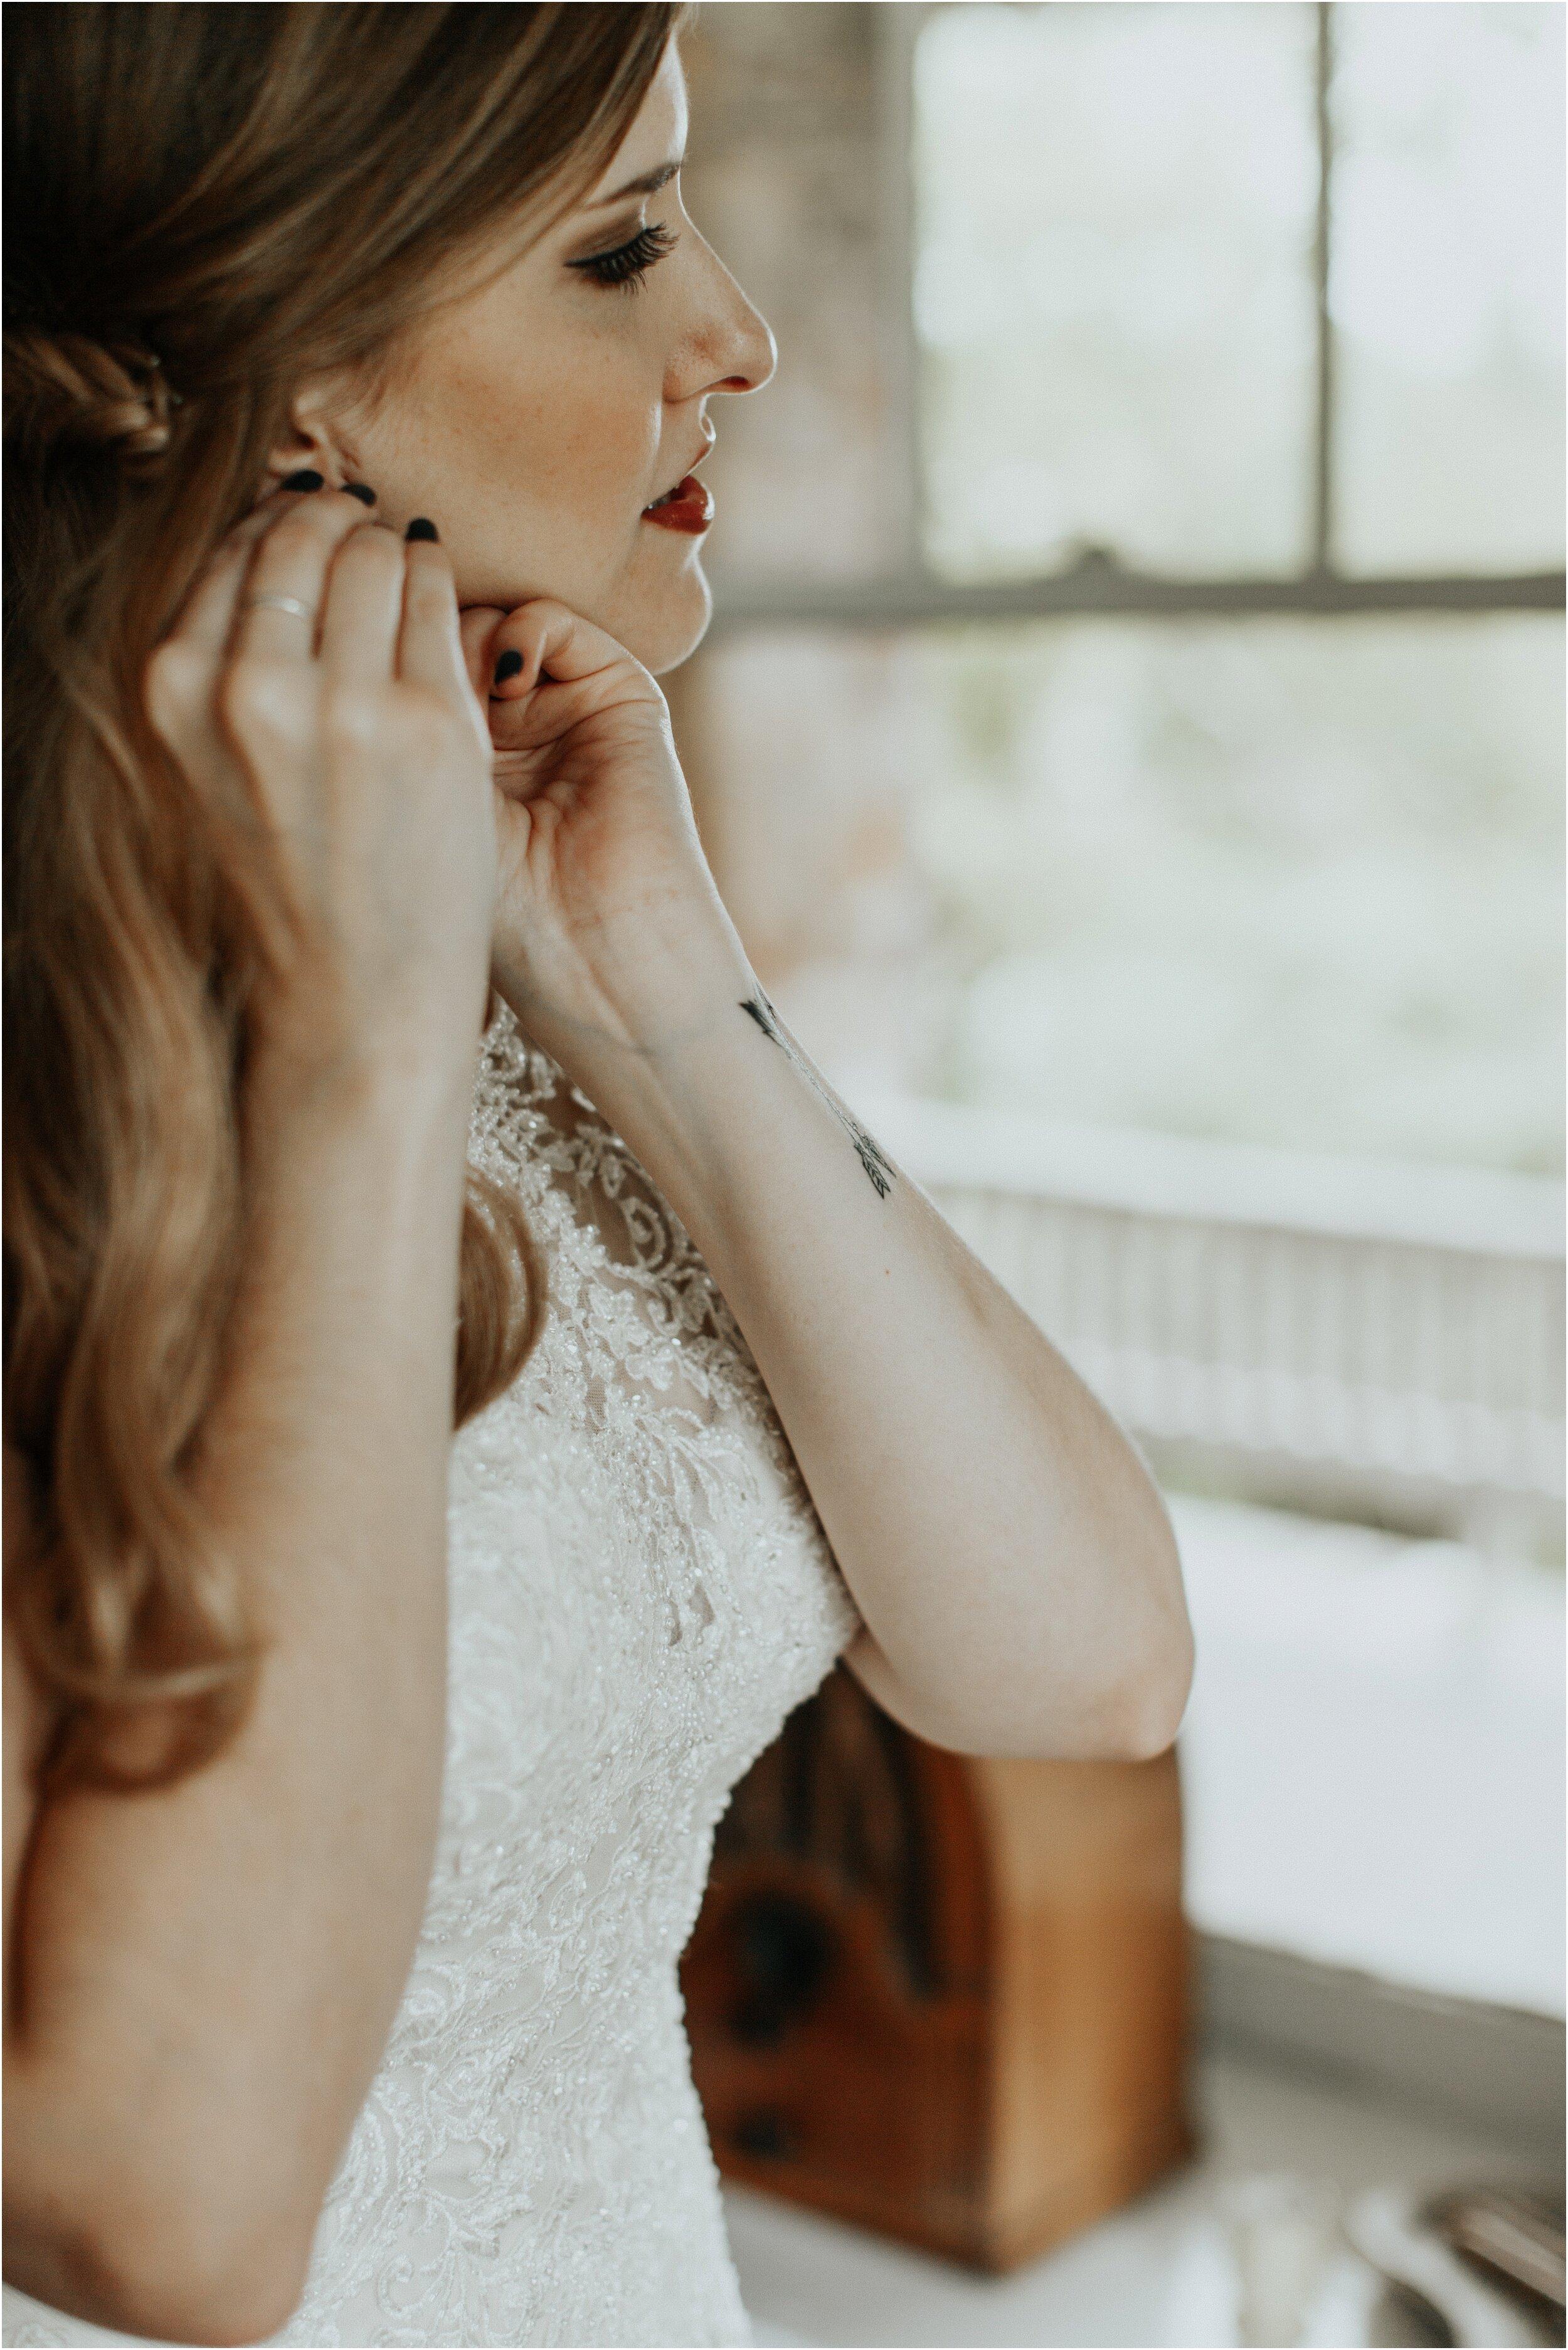 steph-and-jordan-cox-our-wedding-historic-shady-lane-compass-wedding-collective-hazel-lining-photography-destination-elopement-wedding-engagement-photography_0014.jpg